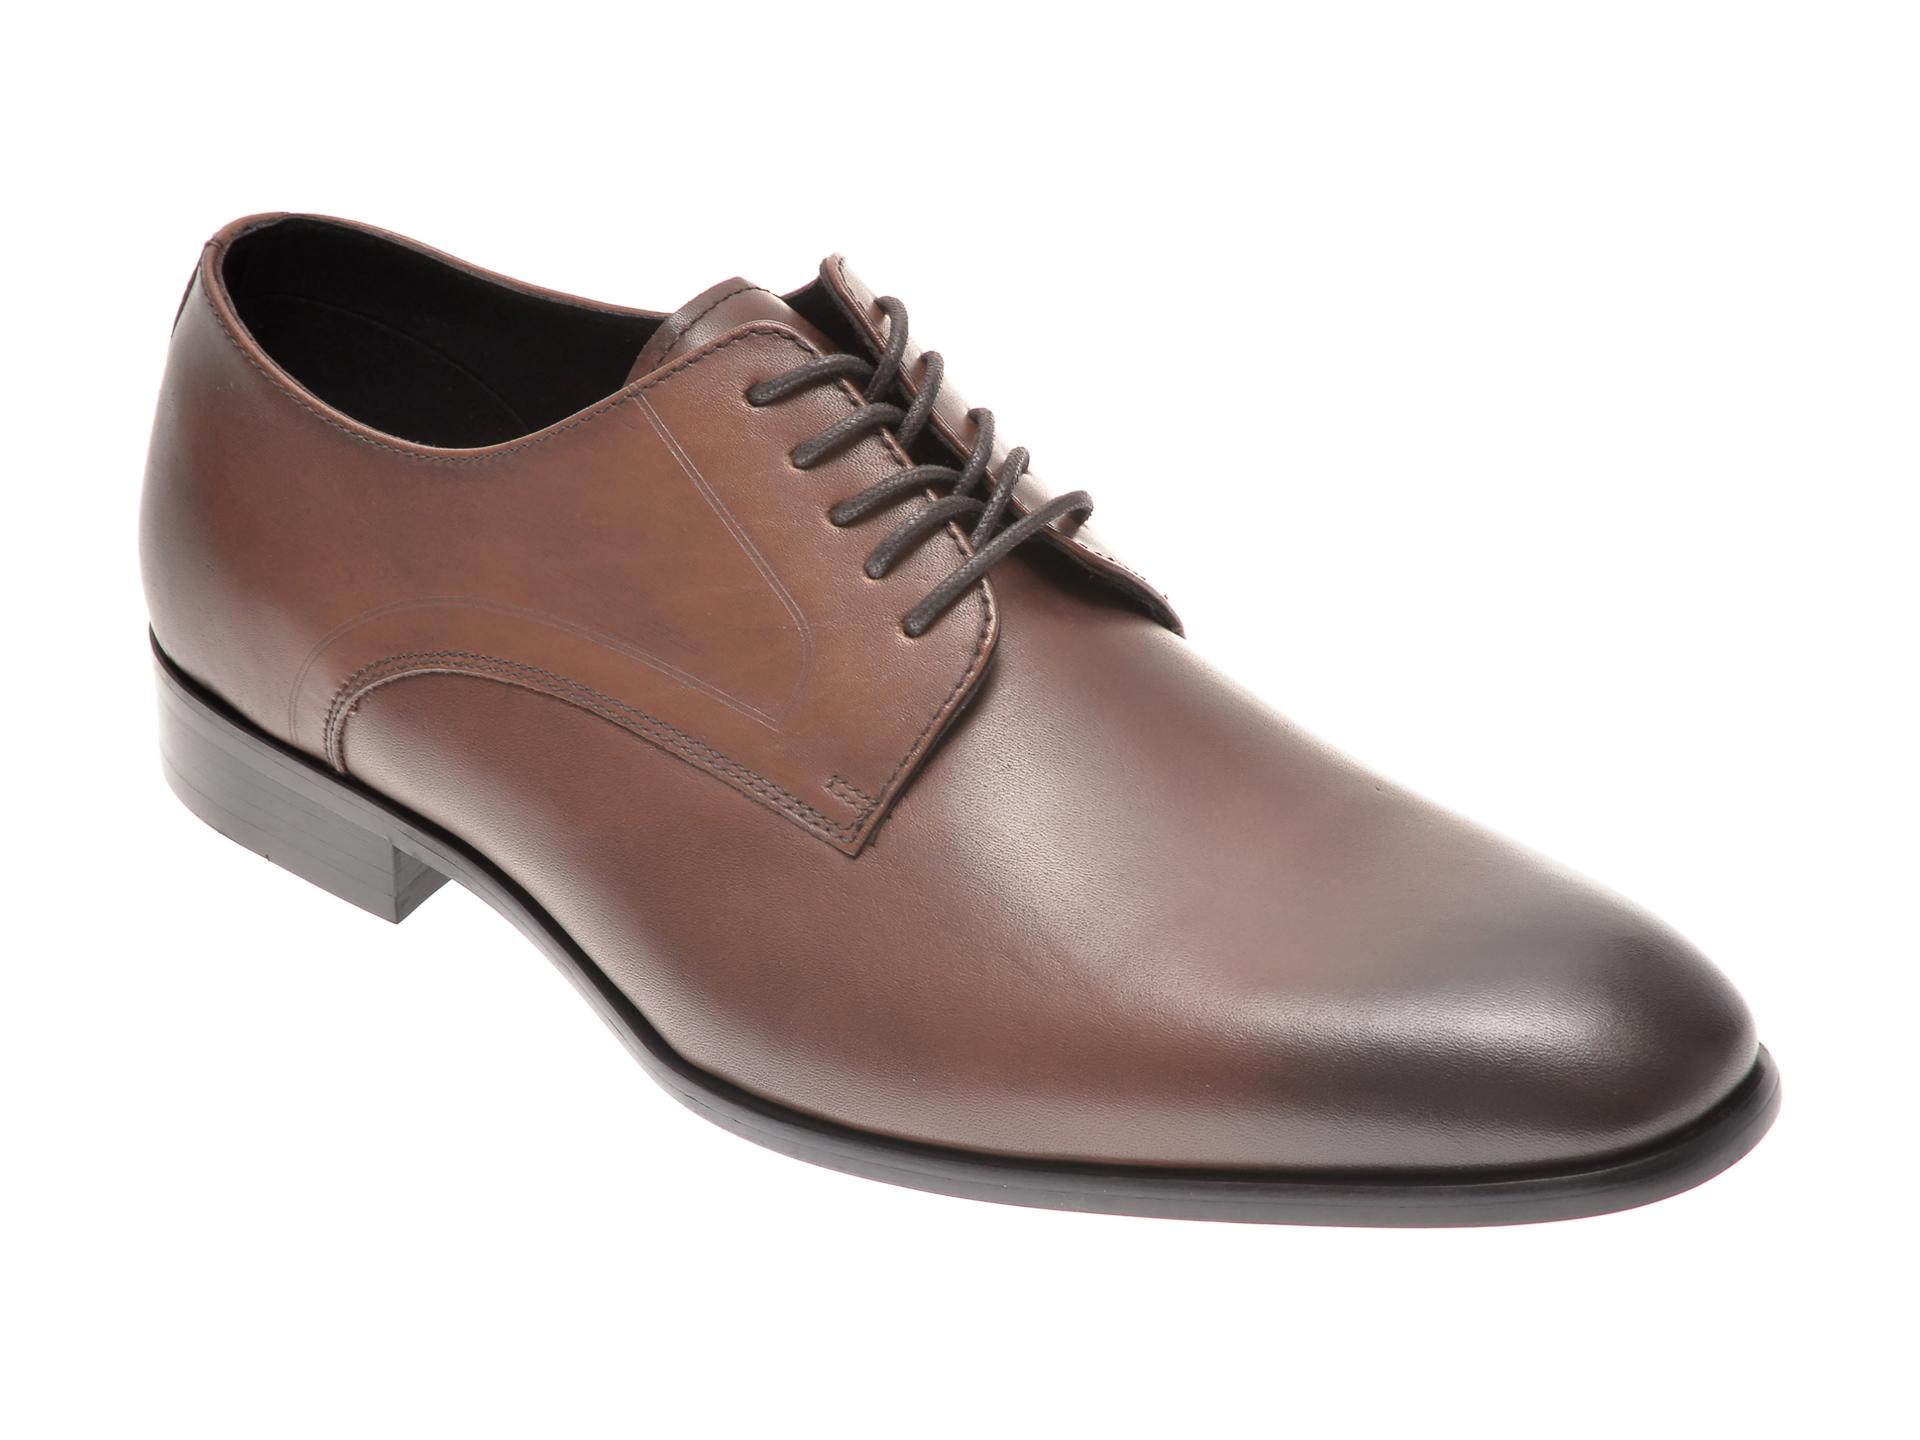 Pantofi Aldo Maro, Proven201, Din Piele Naturala